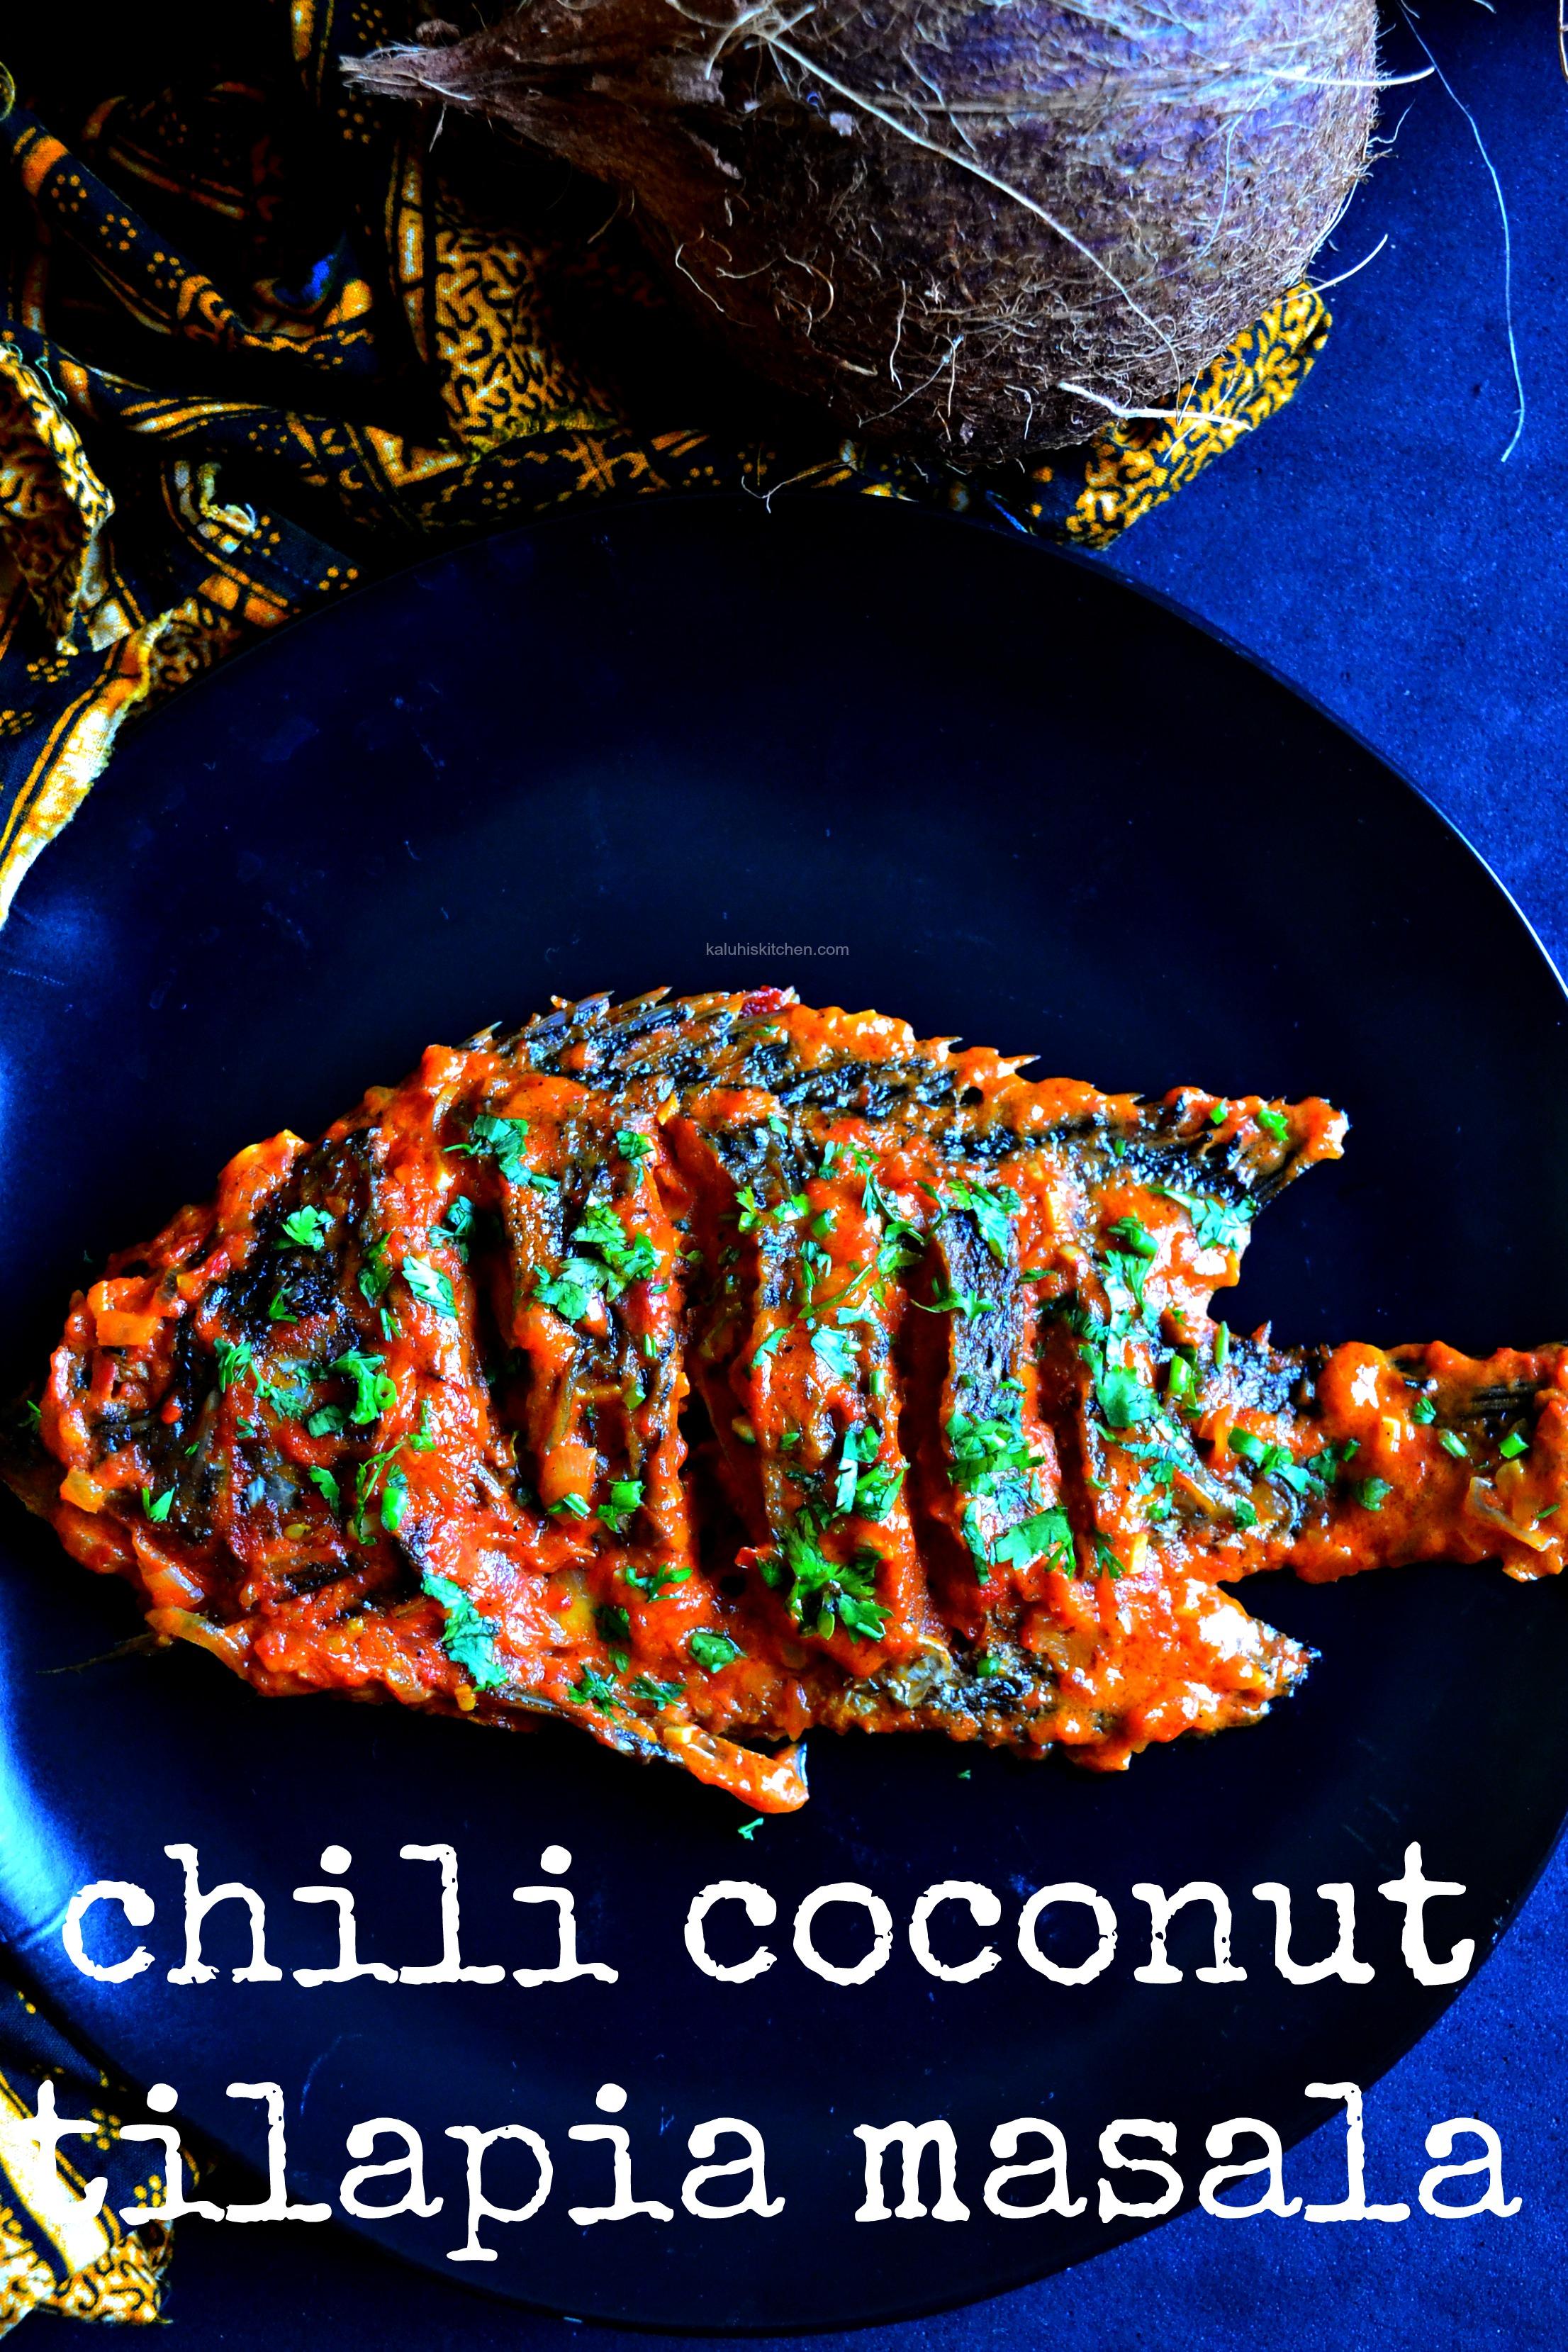 chili-coconut-tilapia-masala_how-to-cook-tilapia_best-tilapia-recipes_best-kenyan-food-bloggers_bestafrican-food-bloggers_kaluhiskitchen-com